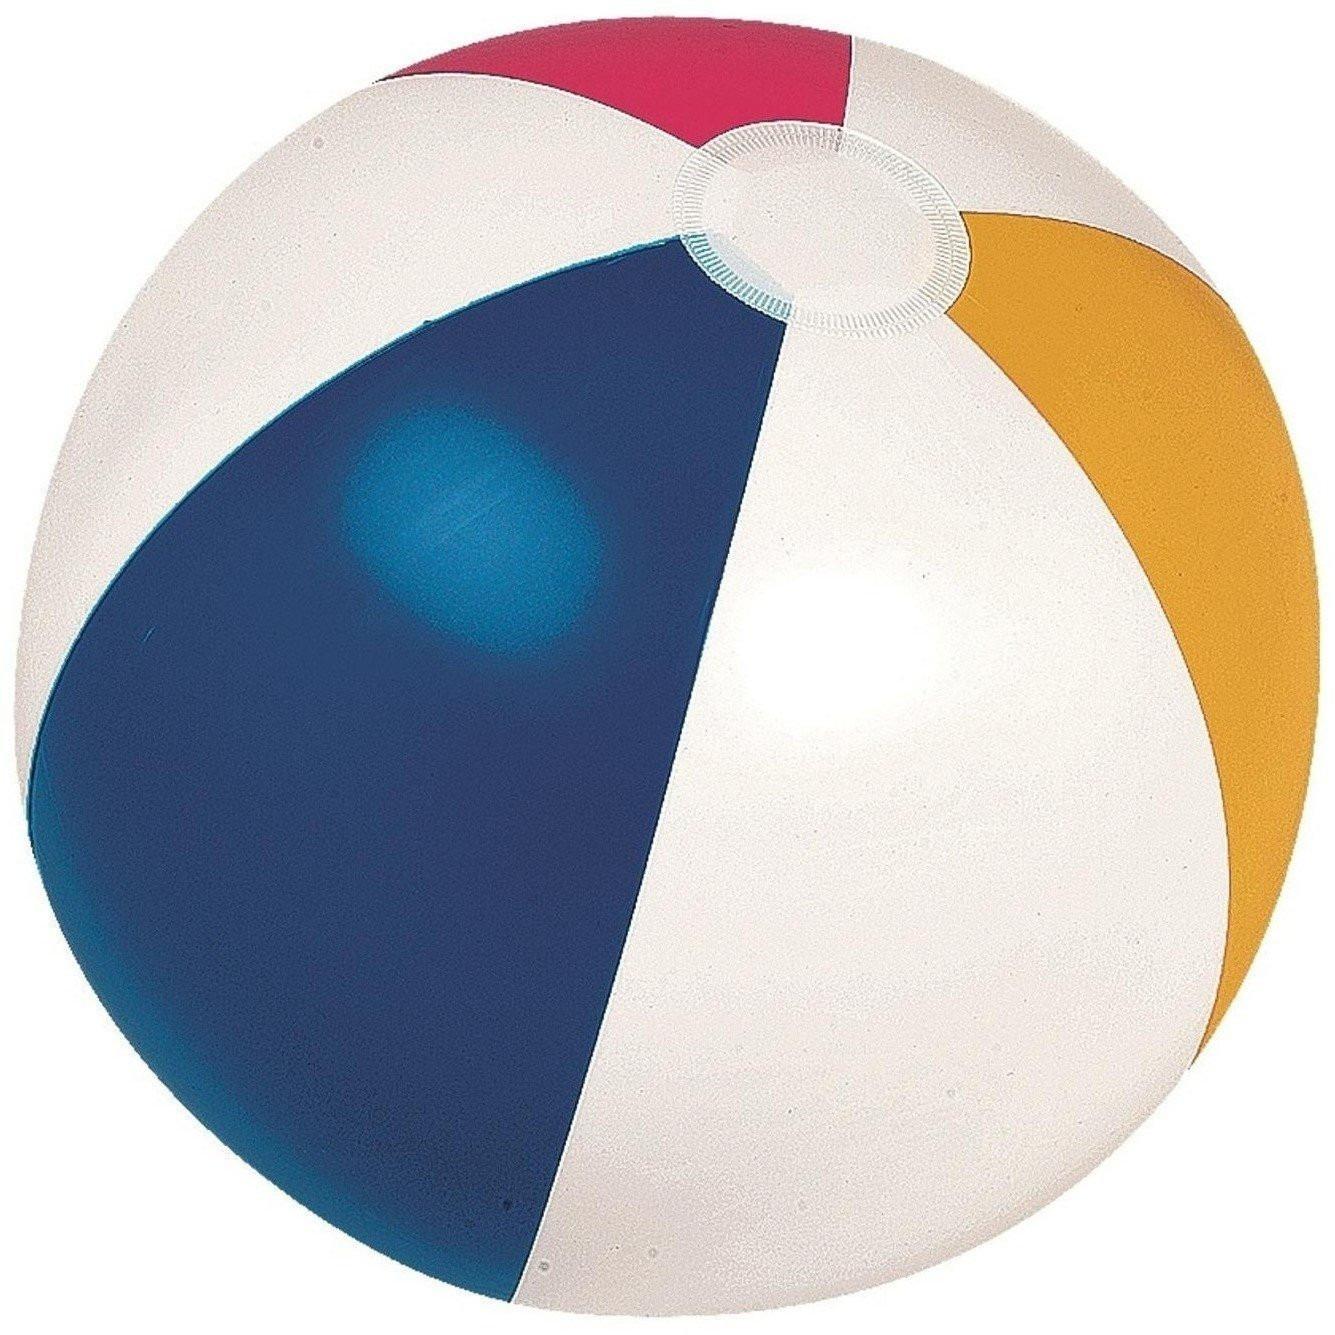 Jilong 20 Classic Inflatable 6 Panel Beach Ball Swimming Pool Toy 32148183 Swimming Pool Toys Swimming Pools Pool Toys